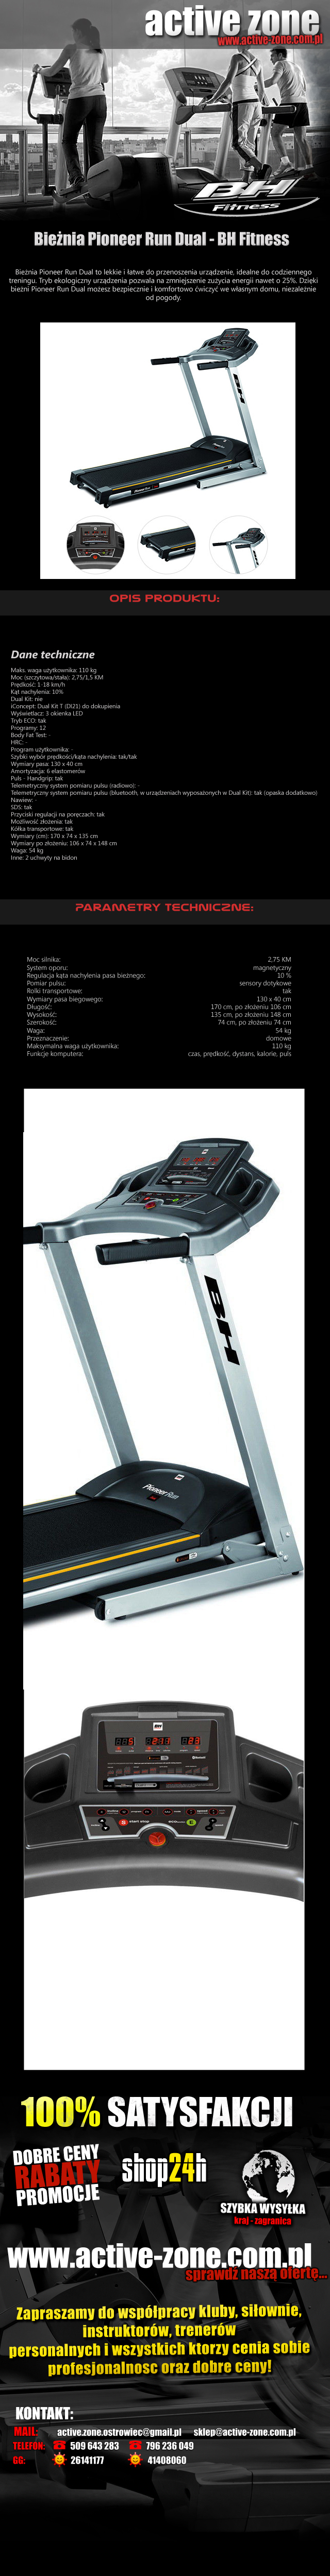 Bieżnia Pioneer Run Dual - BH Fitness 1